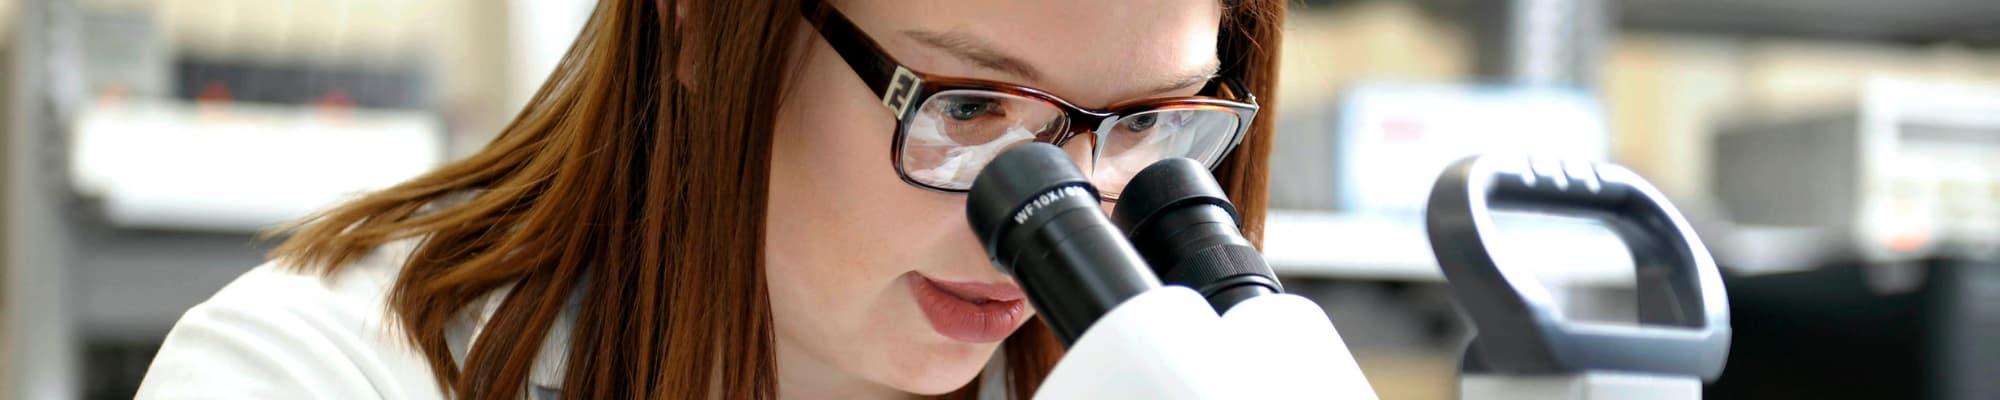 Image of student using microscope